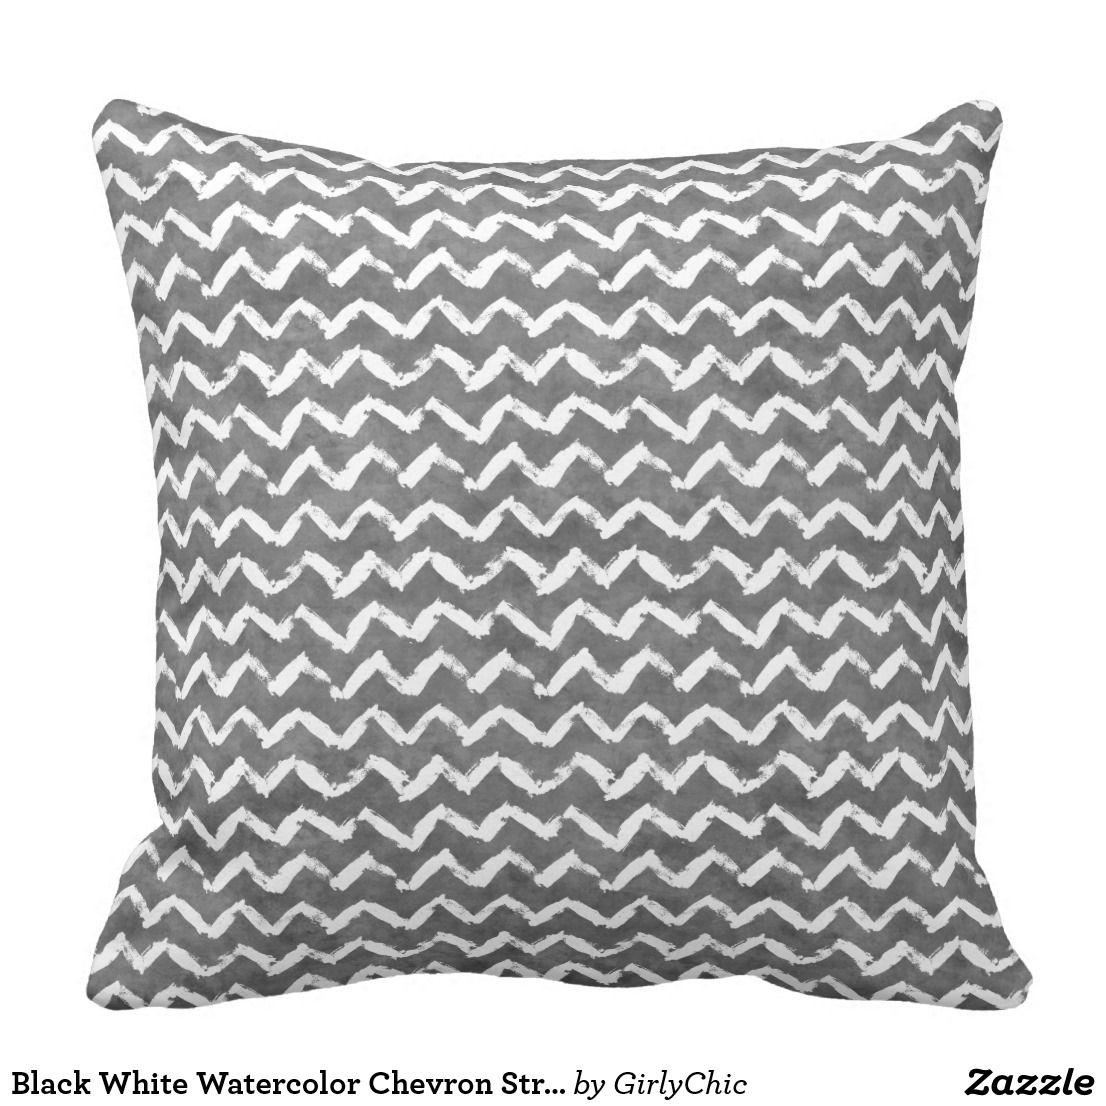 Black white watercolor chevron stripes throw pillow for the home